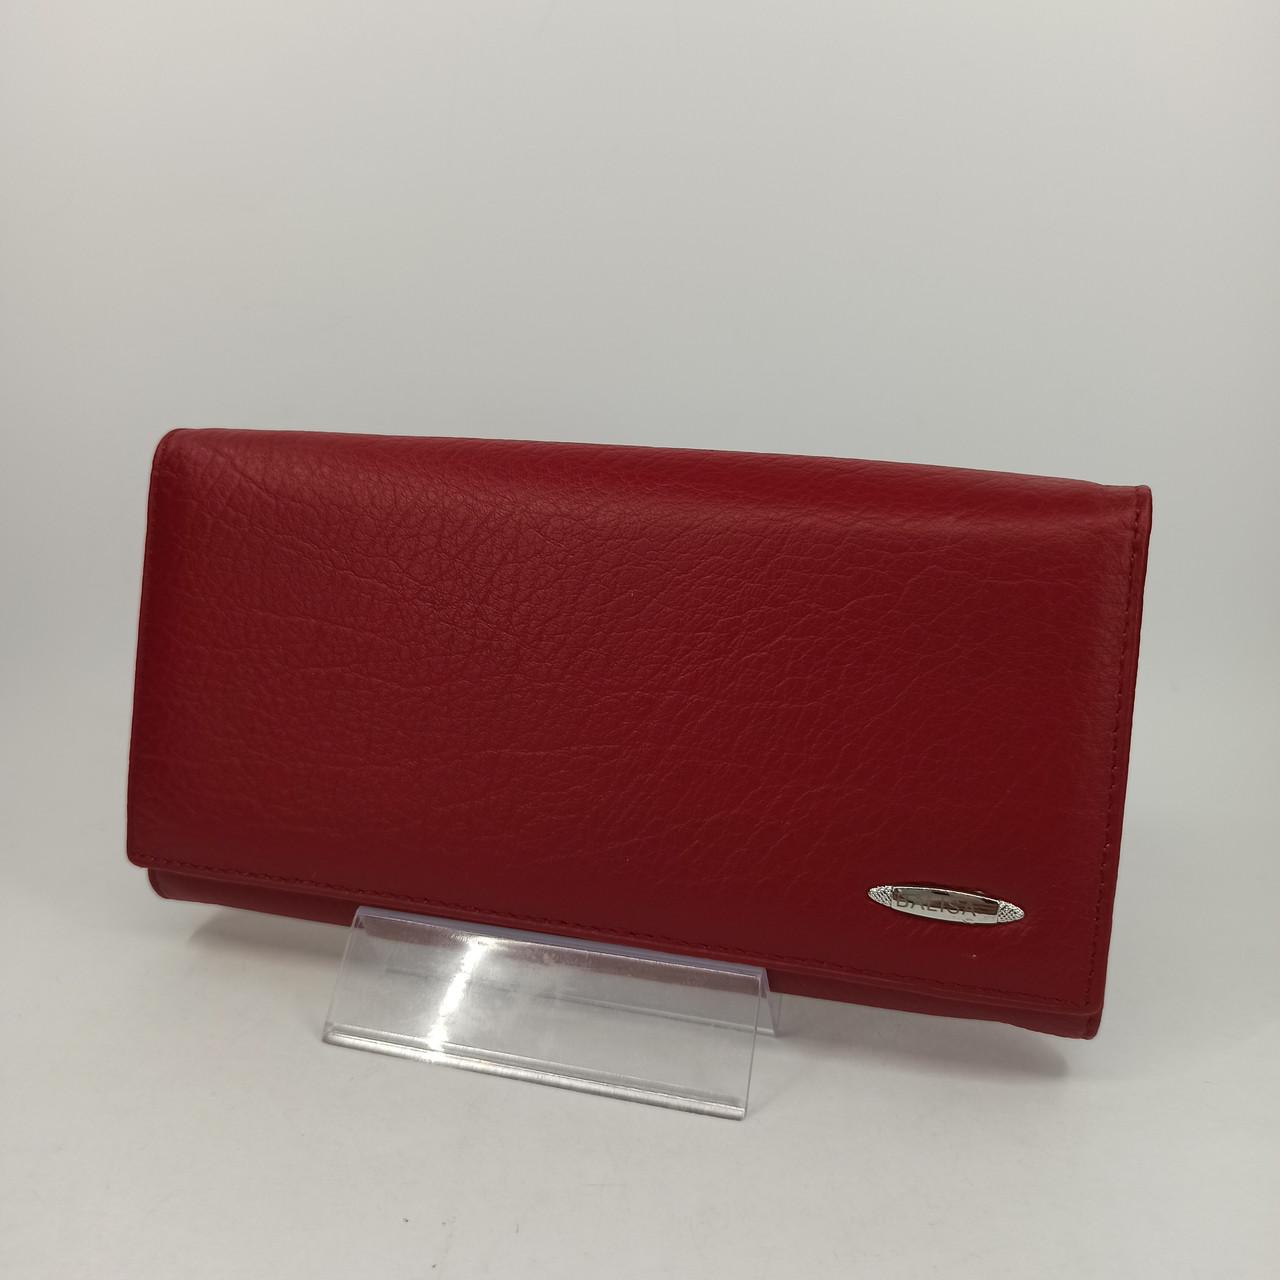 Класичний шкіряний жіночий гаманець / Классический кожаный женский кошелек Balisa B105-1013-4 red